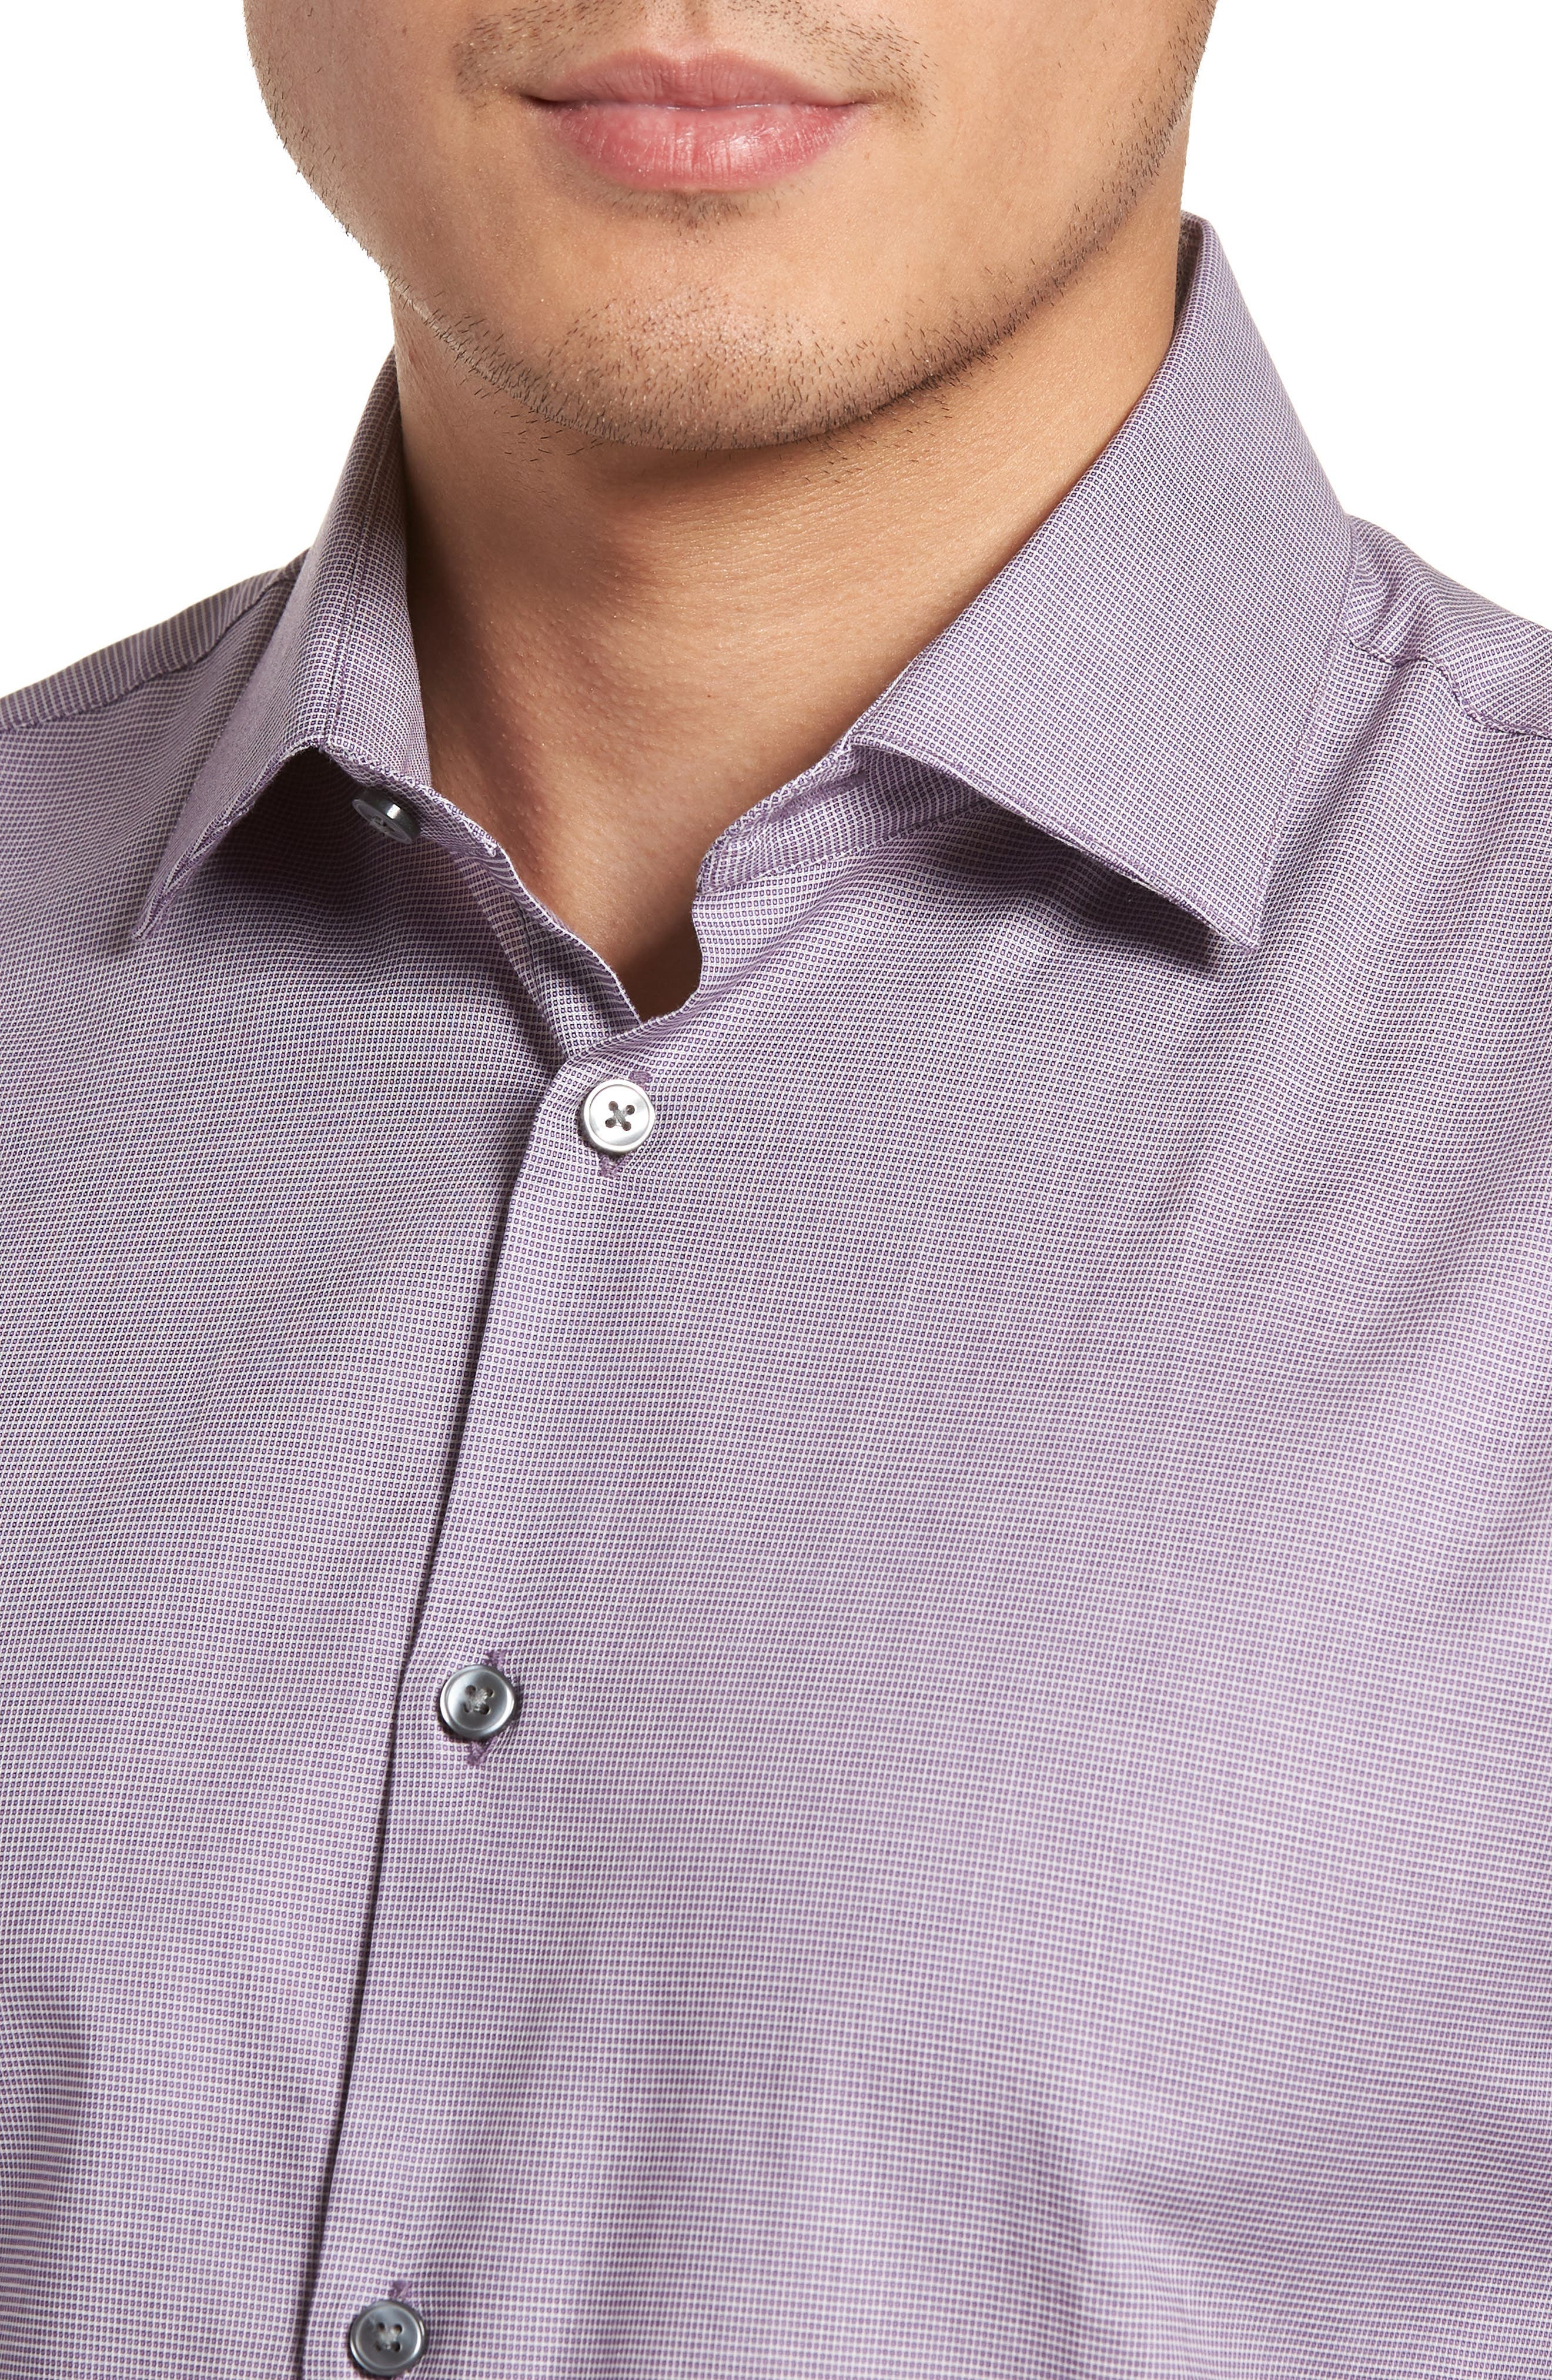 Slim Fit Stretch Microdot Dress Shirt,                             Alternate thumbnail 2, color,                             Purple